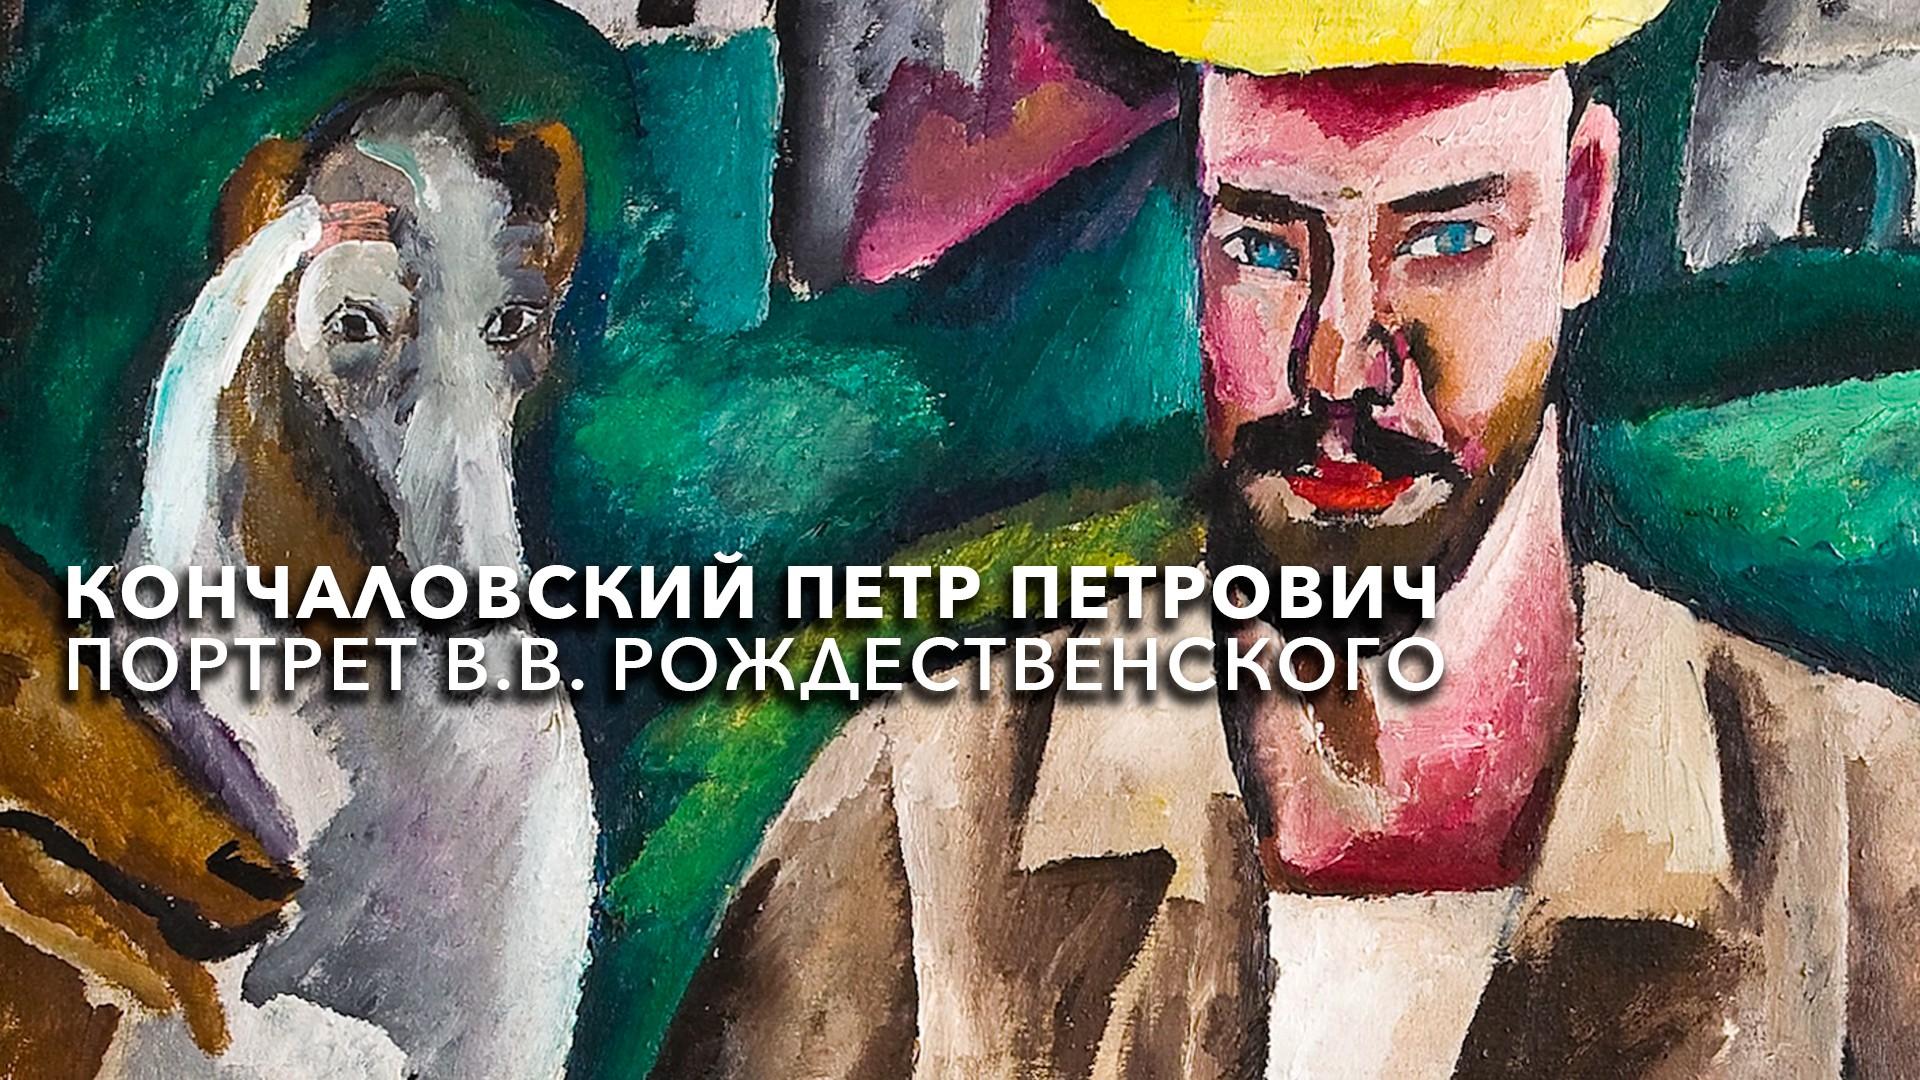 Кончаловский Петр Петрович. Портрет В.В. Рождественского